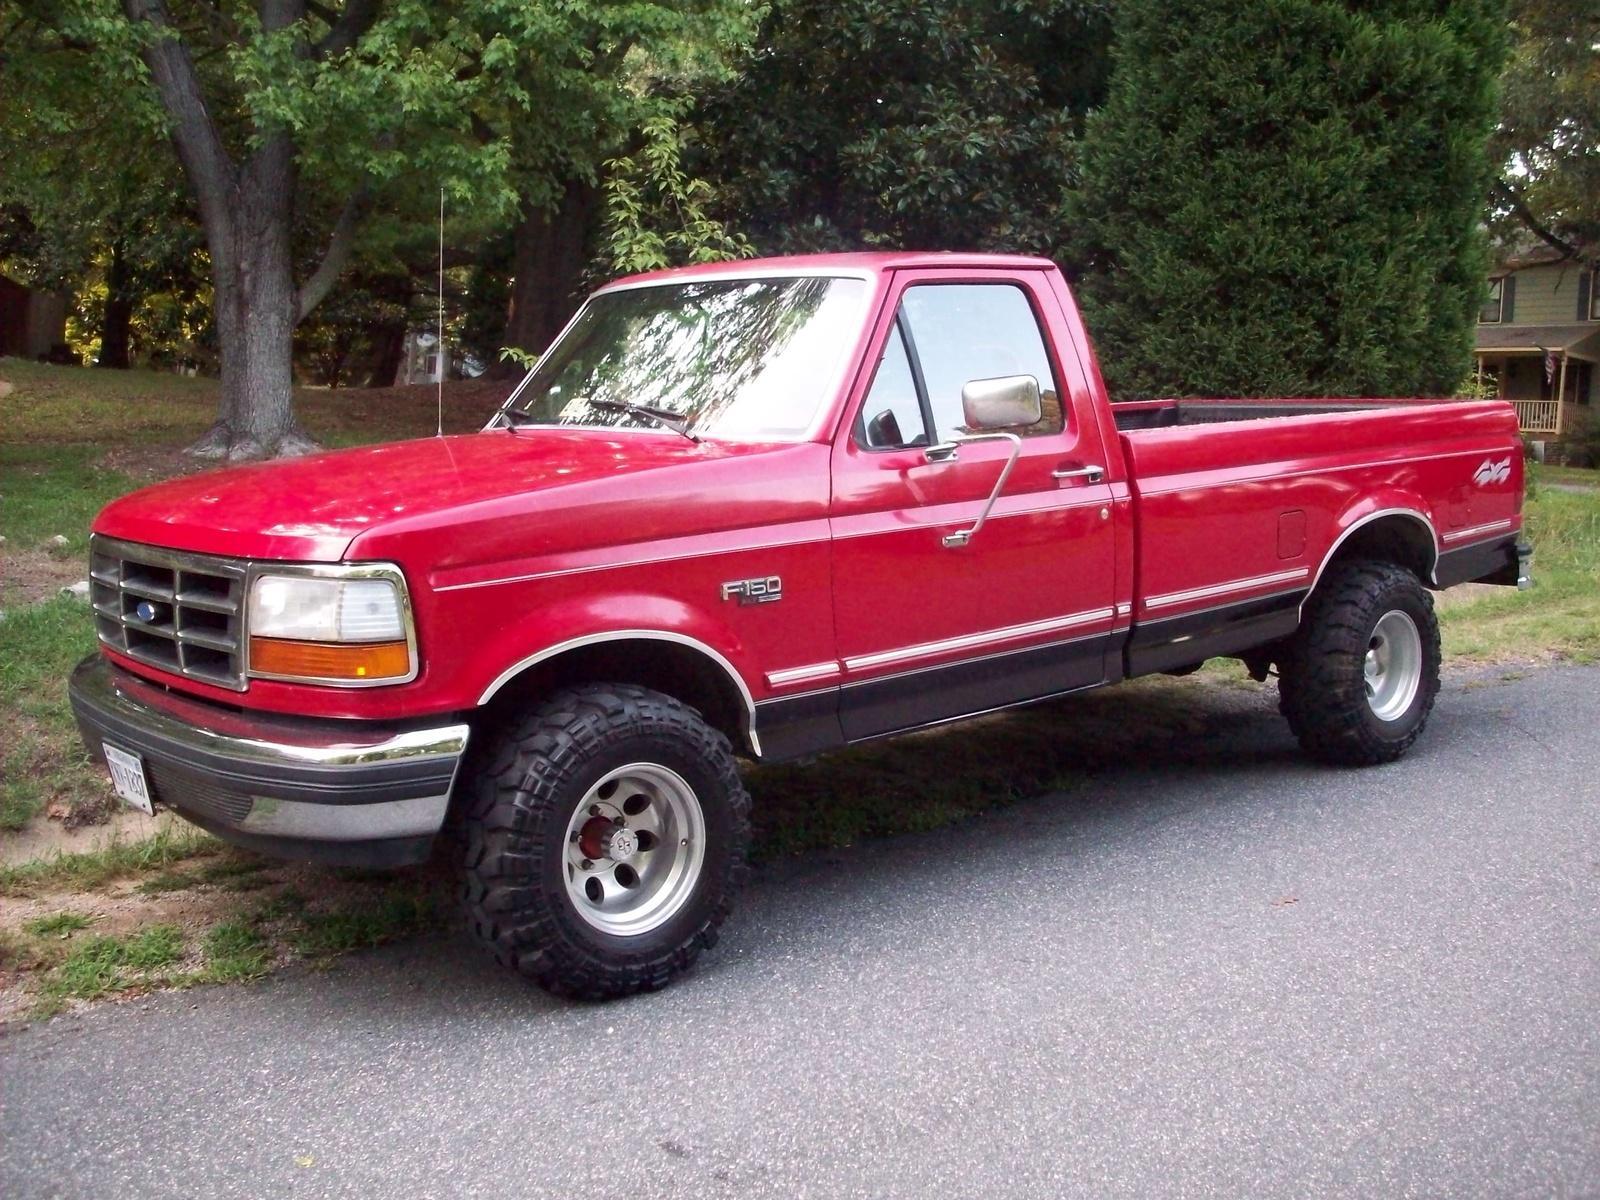 800 1024 1280 1600 origin 1992 ford f 150